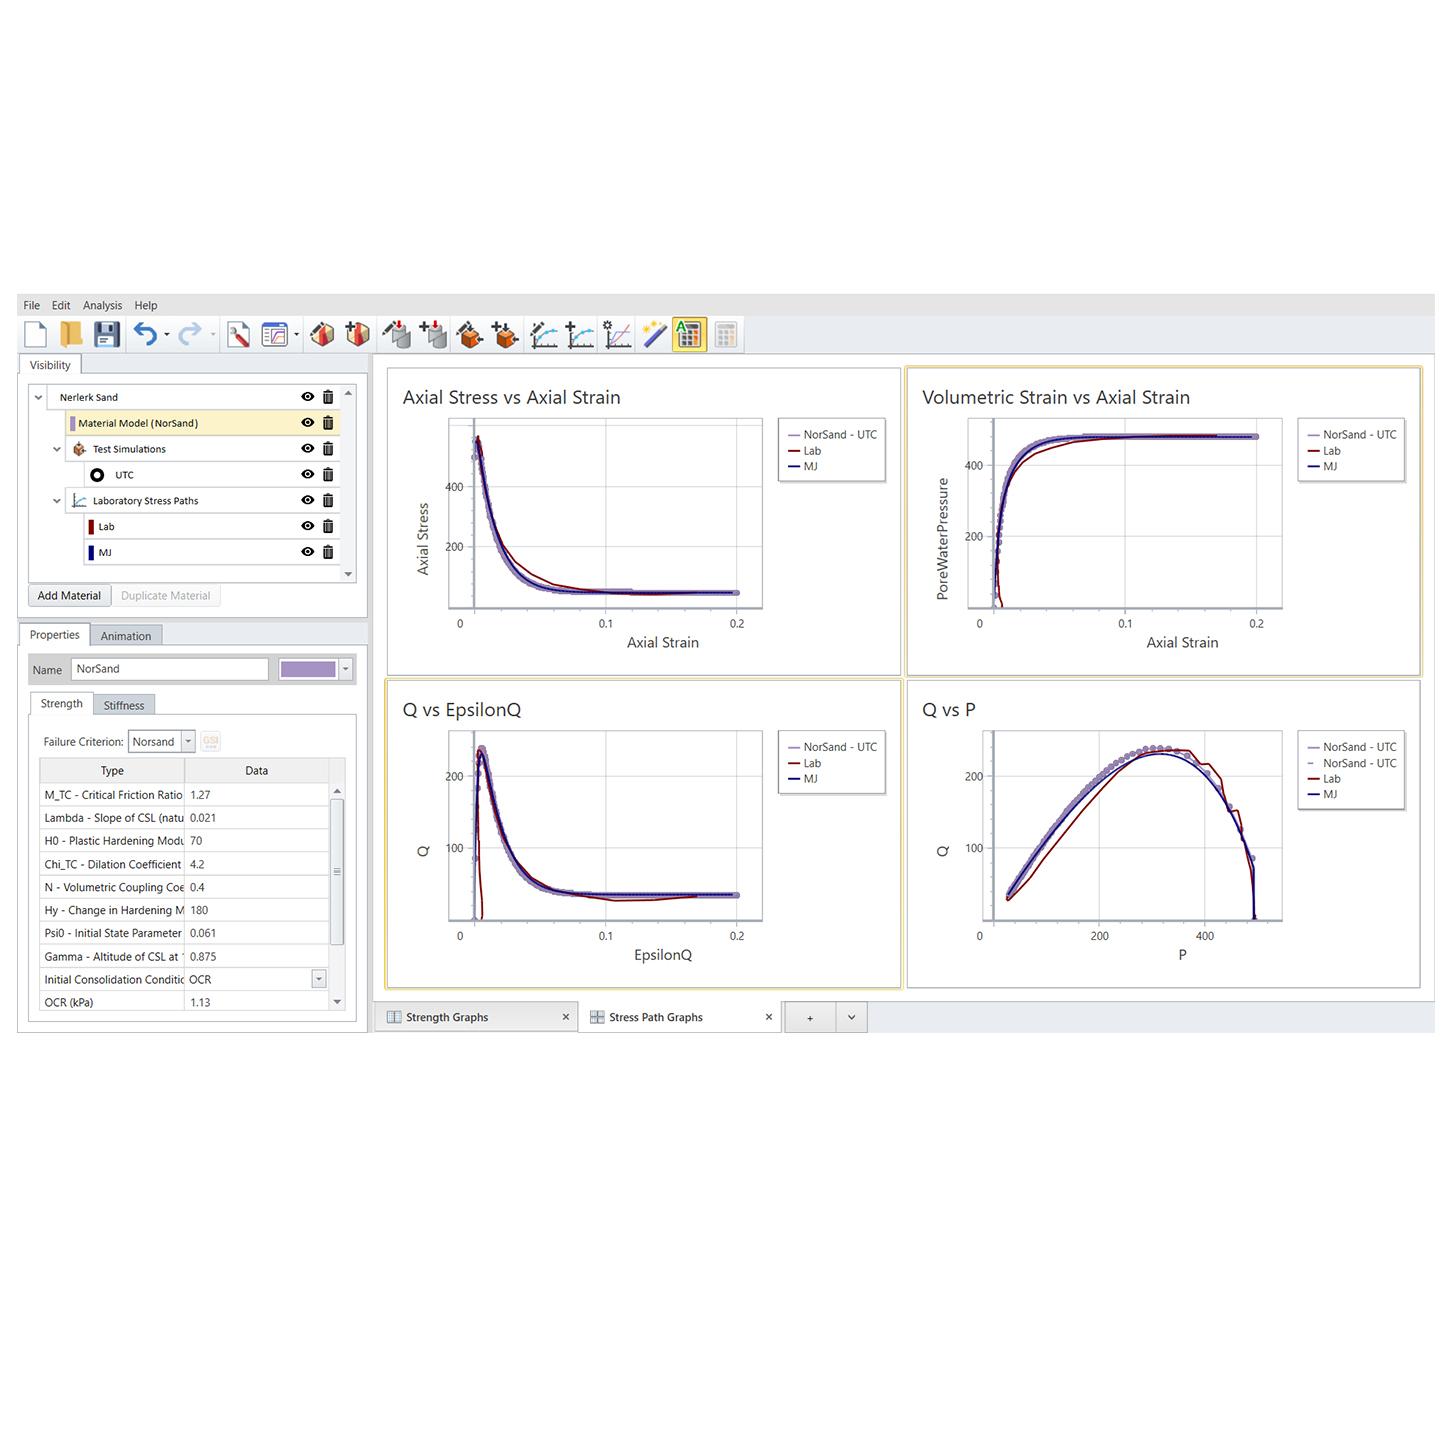 RSData: Stress Path Graphs Tab